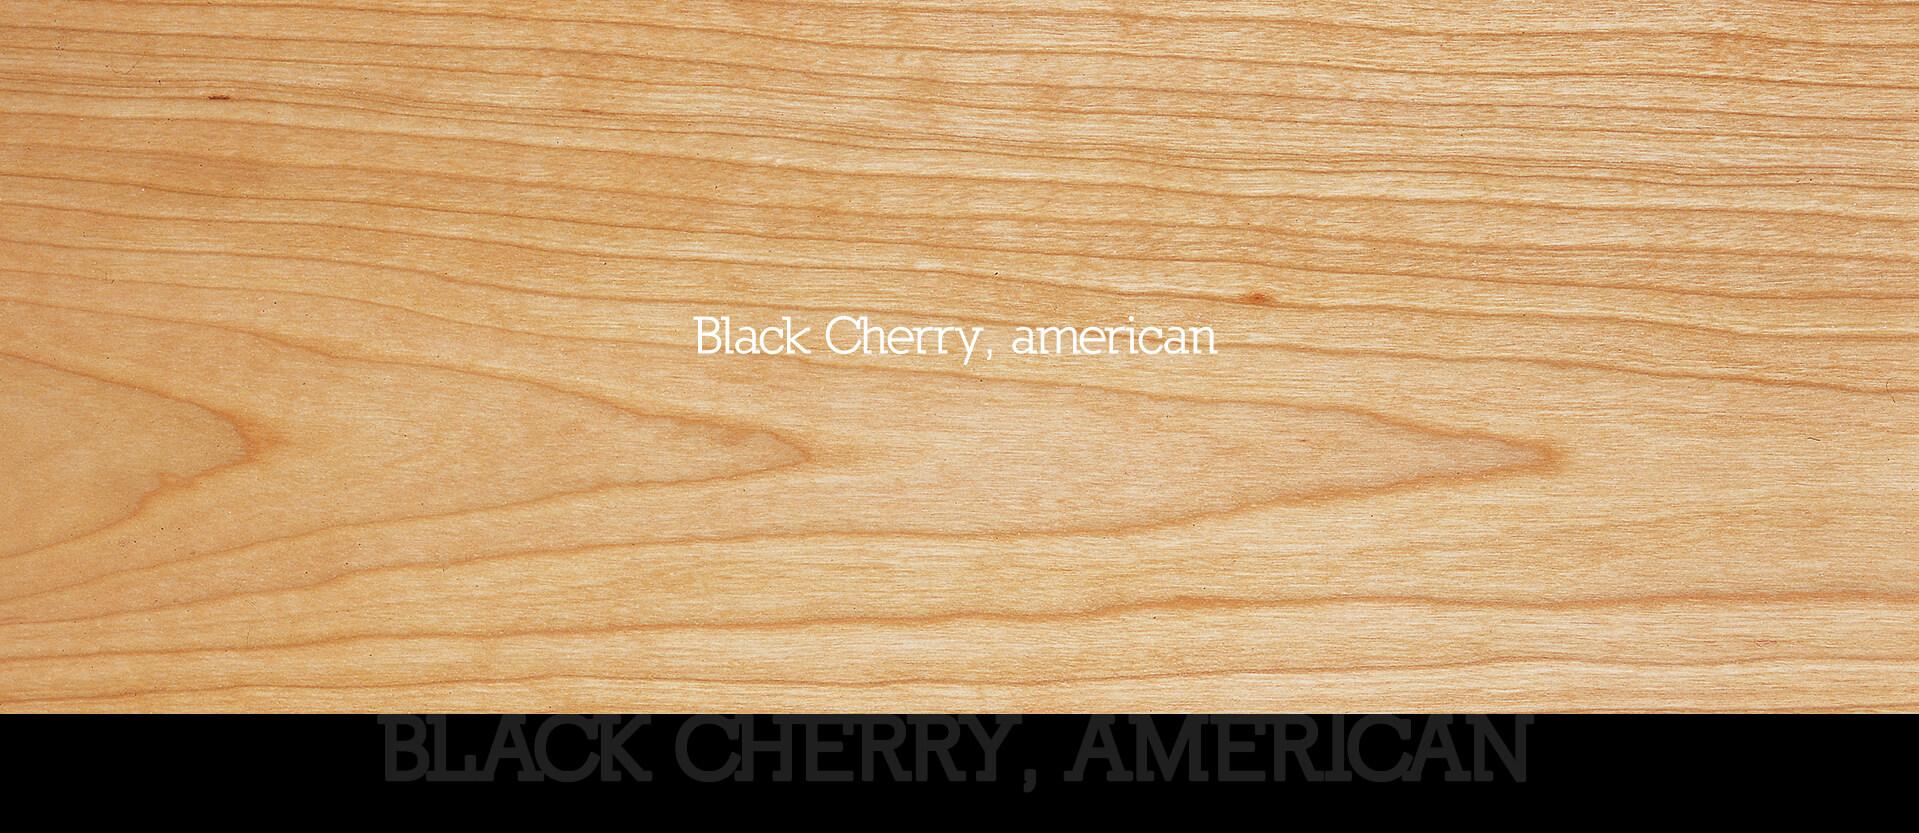 09 Black Cherry american